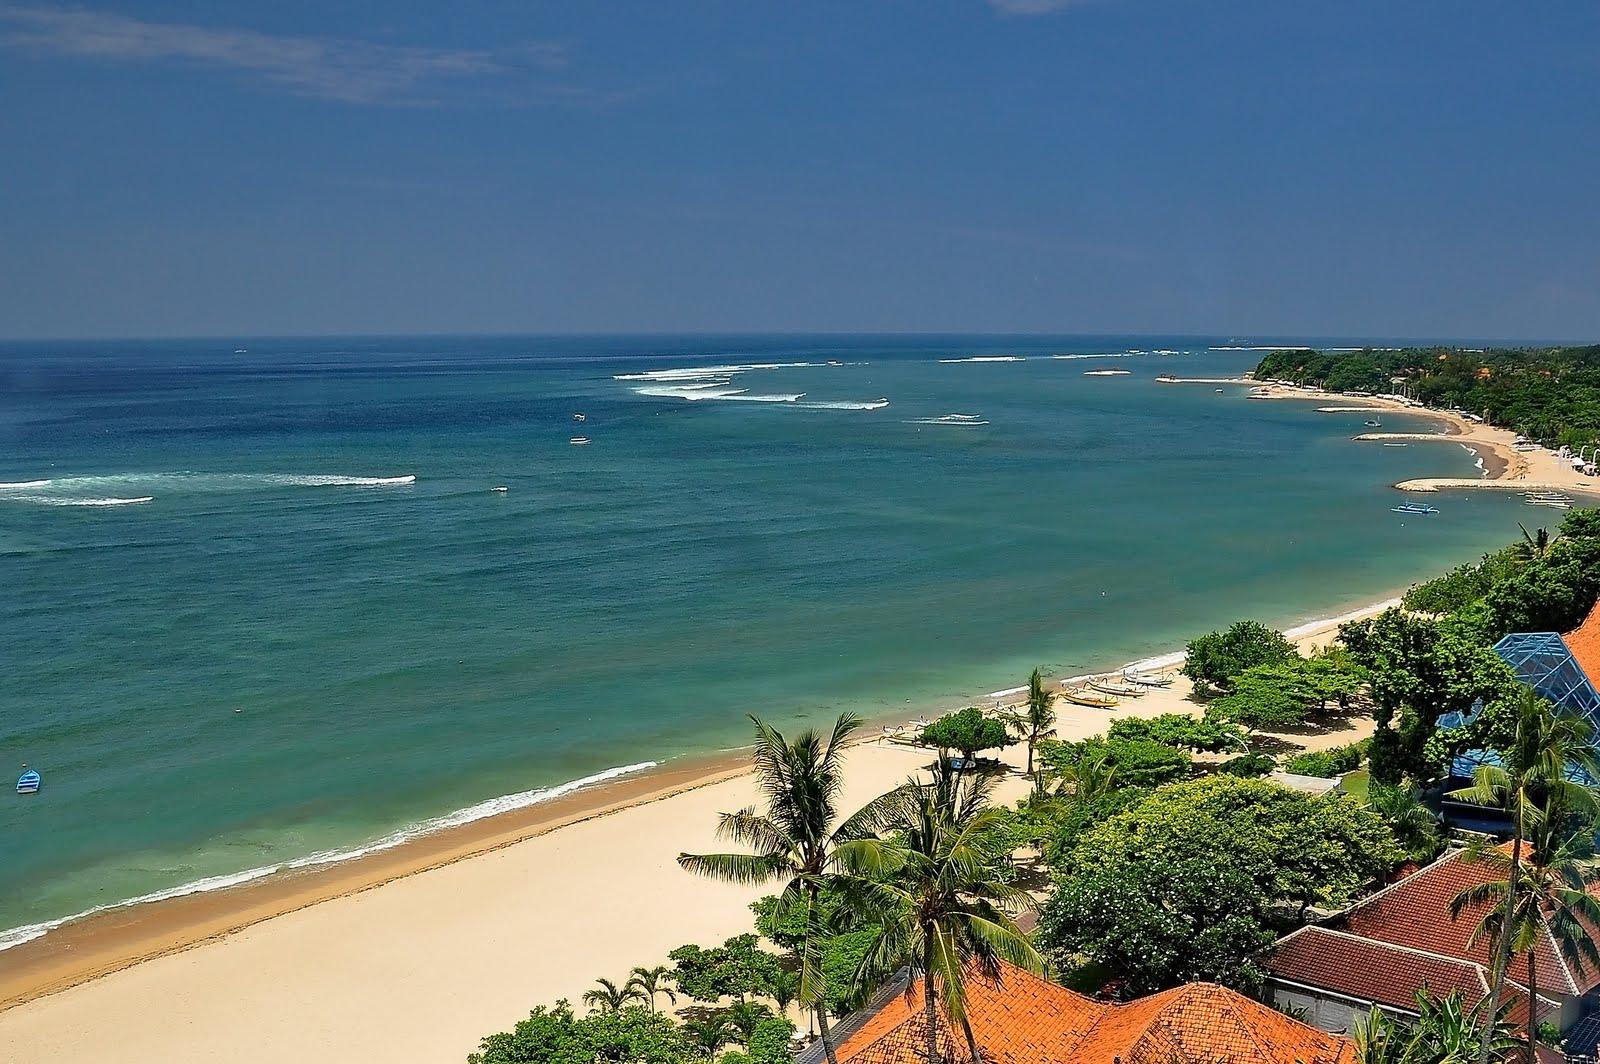 Nature wallpaper sanur beach bali indonesia for Hotel in bali indonesia near beach